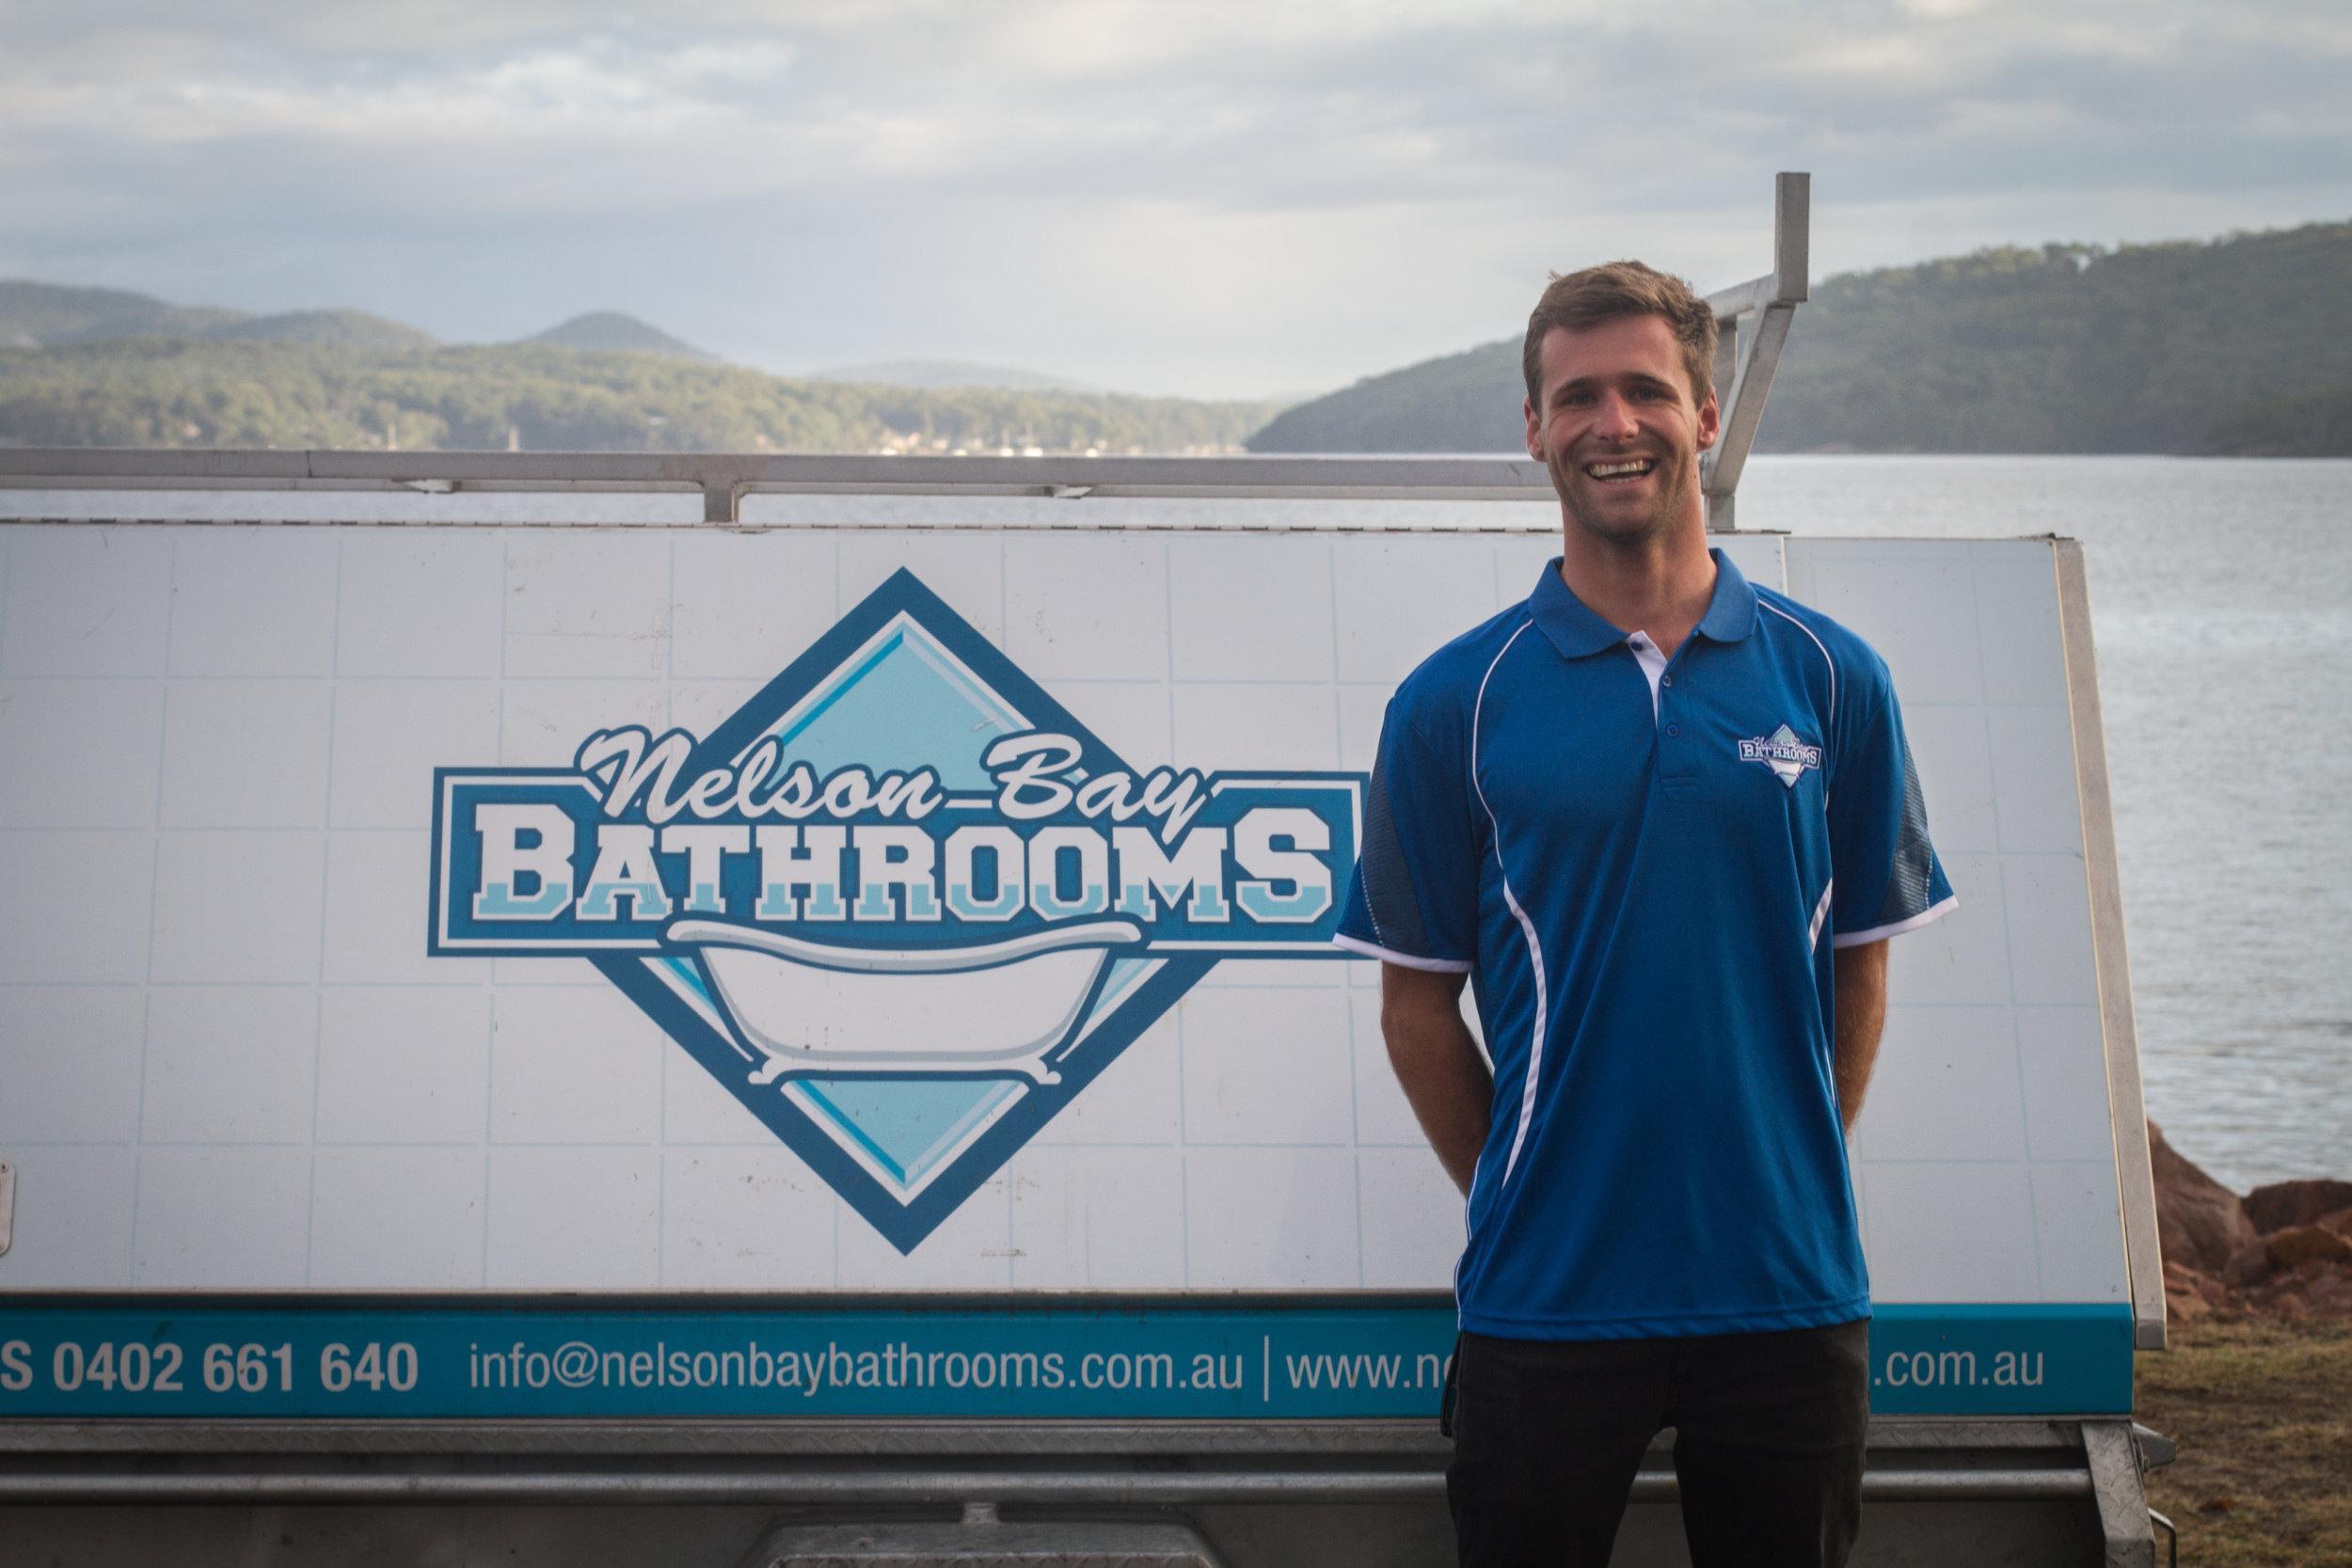 Ryan edmond - Site Foreman & Tradesman